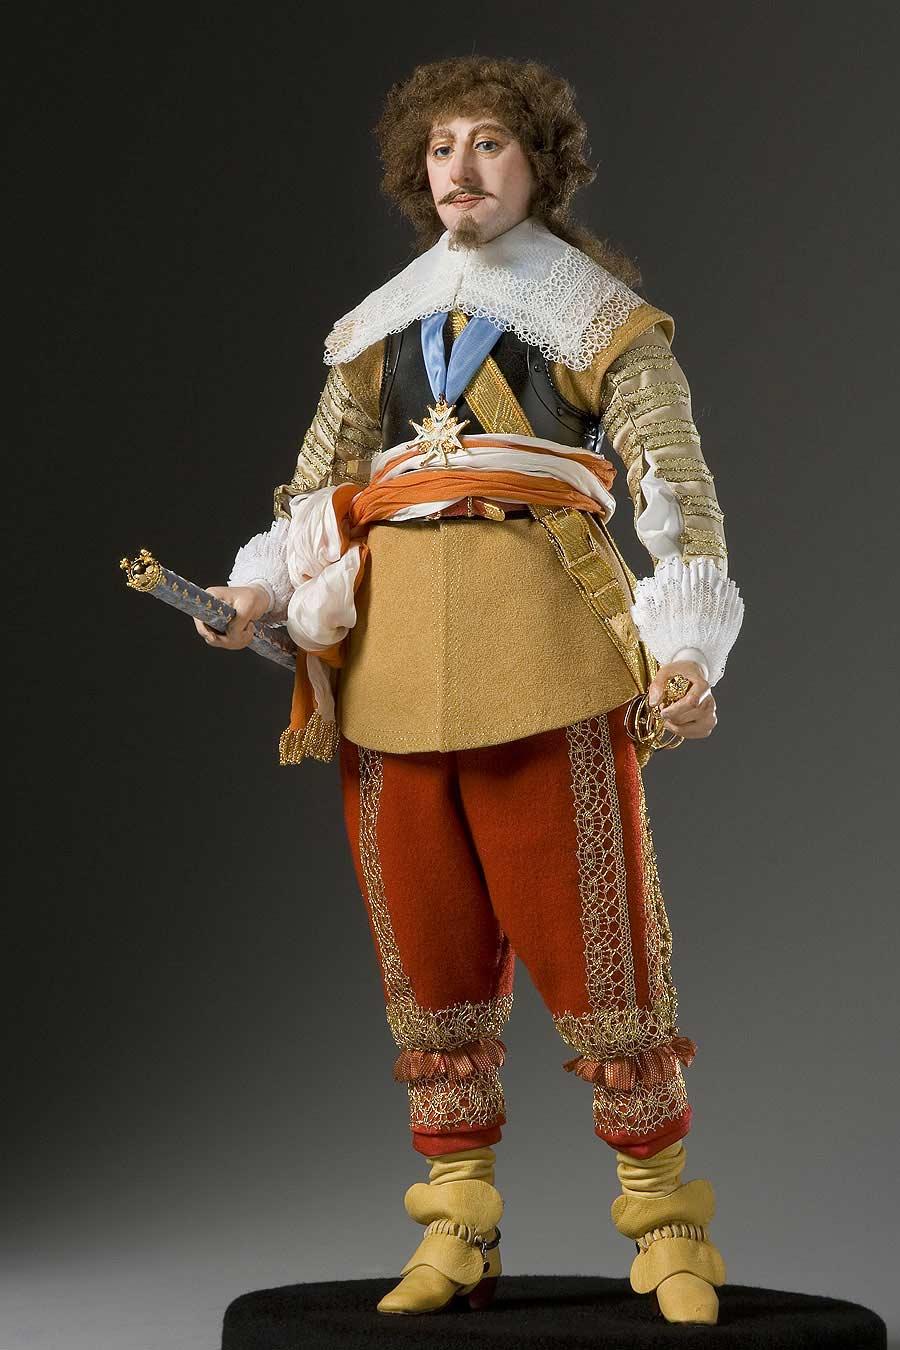 Full length color image of Gaston d' Orleans aka. Gaston of France, by George Stuart.